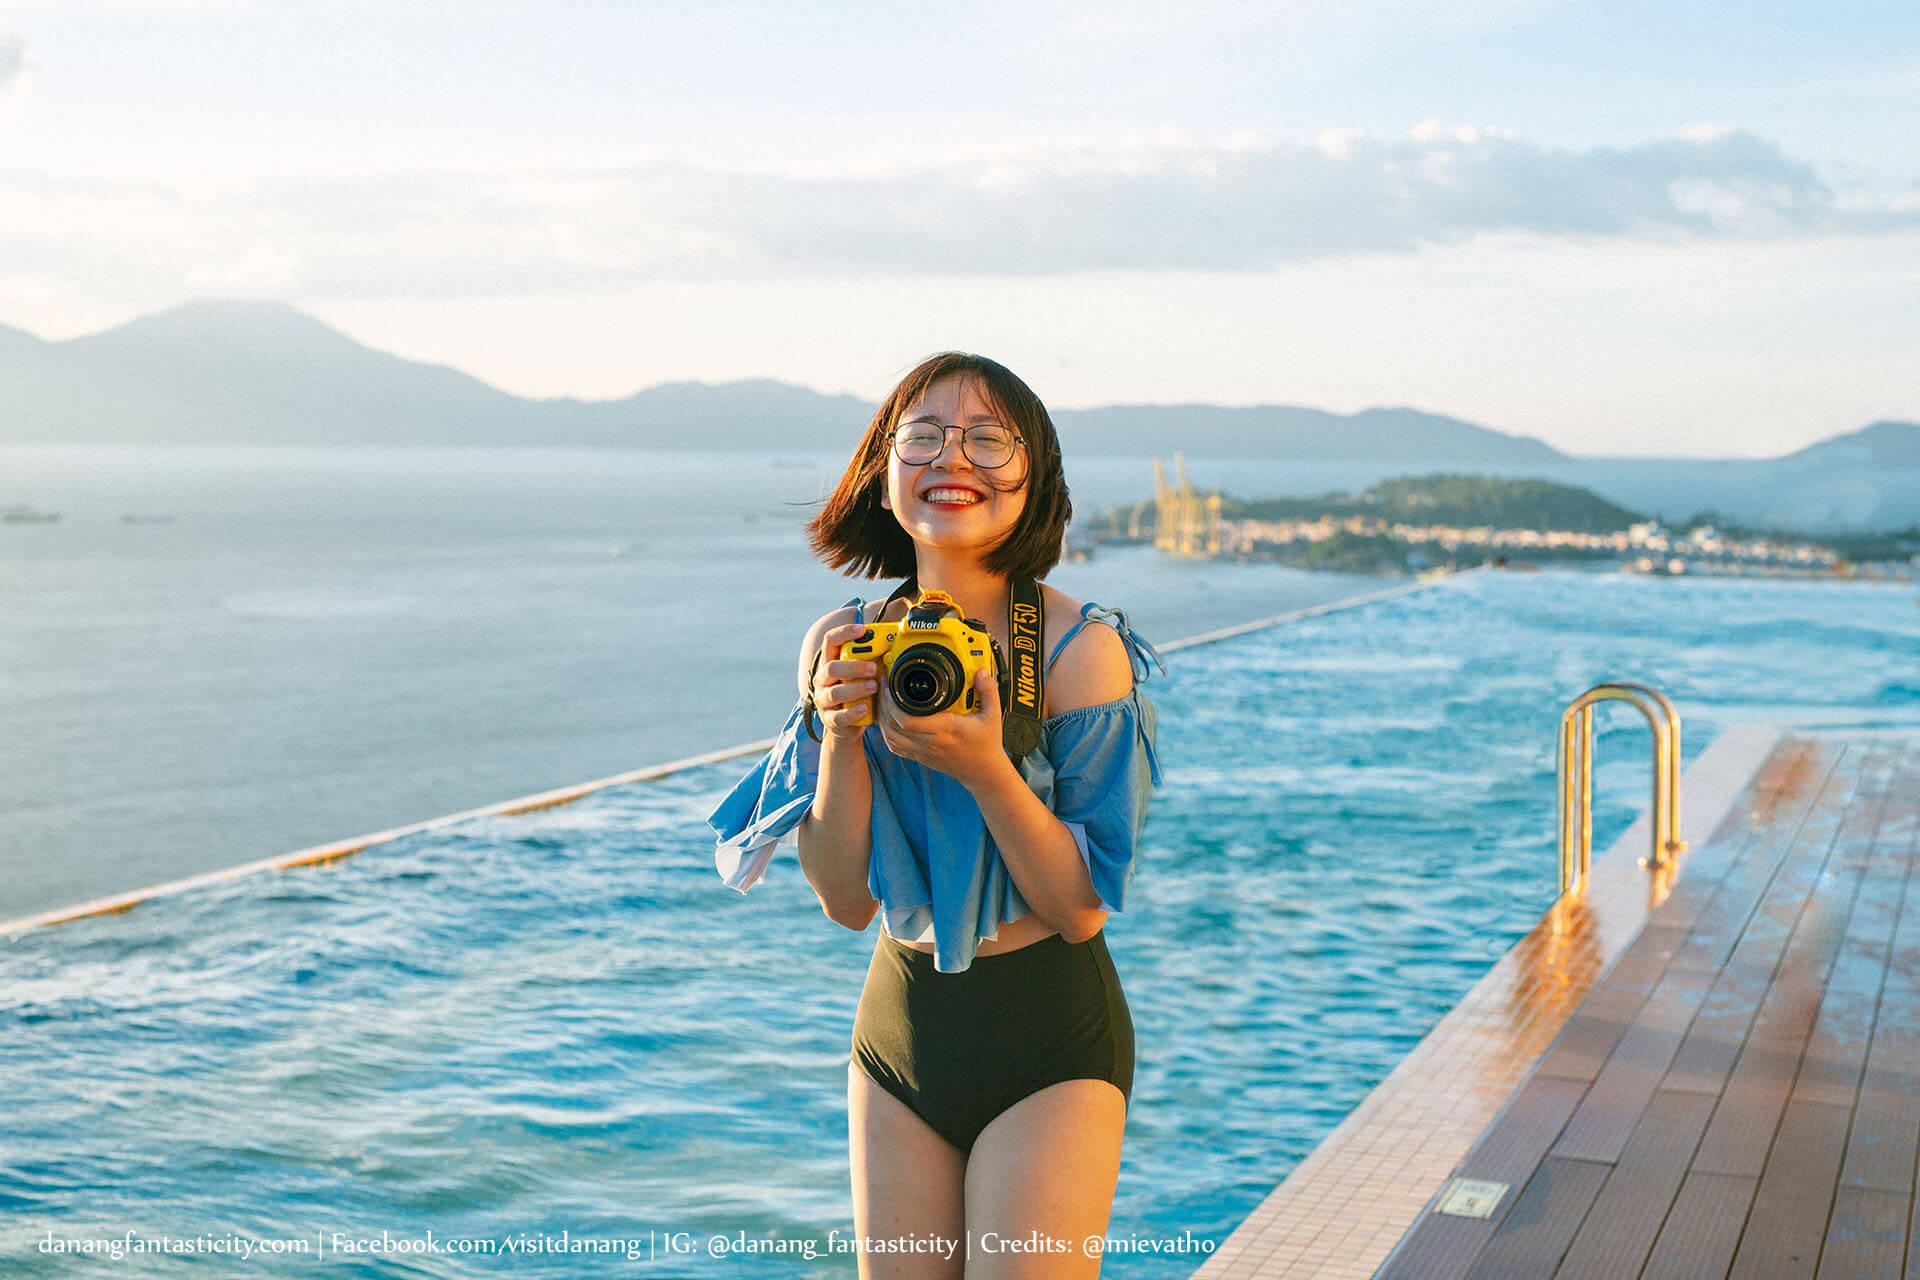 Danang Golden Bay Hoang Hon Vang Cua Da Nang Fantasticity Com 021